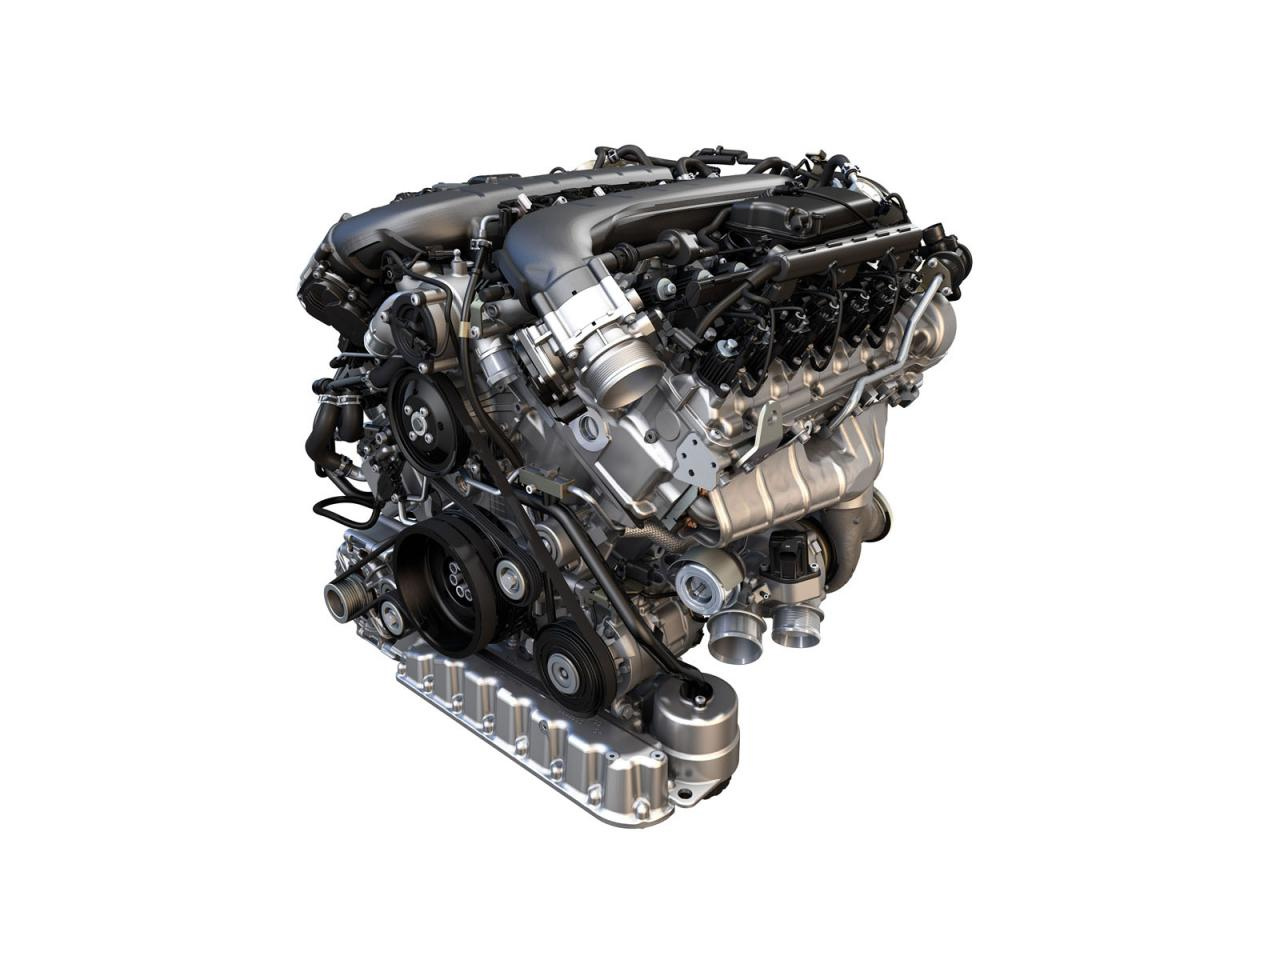 Volkswagen W12 TSI 6.0 двигатель 2015